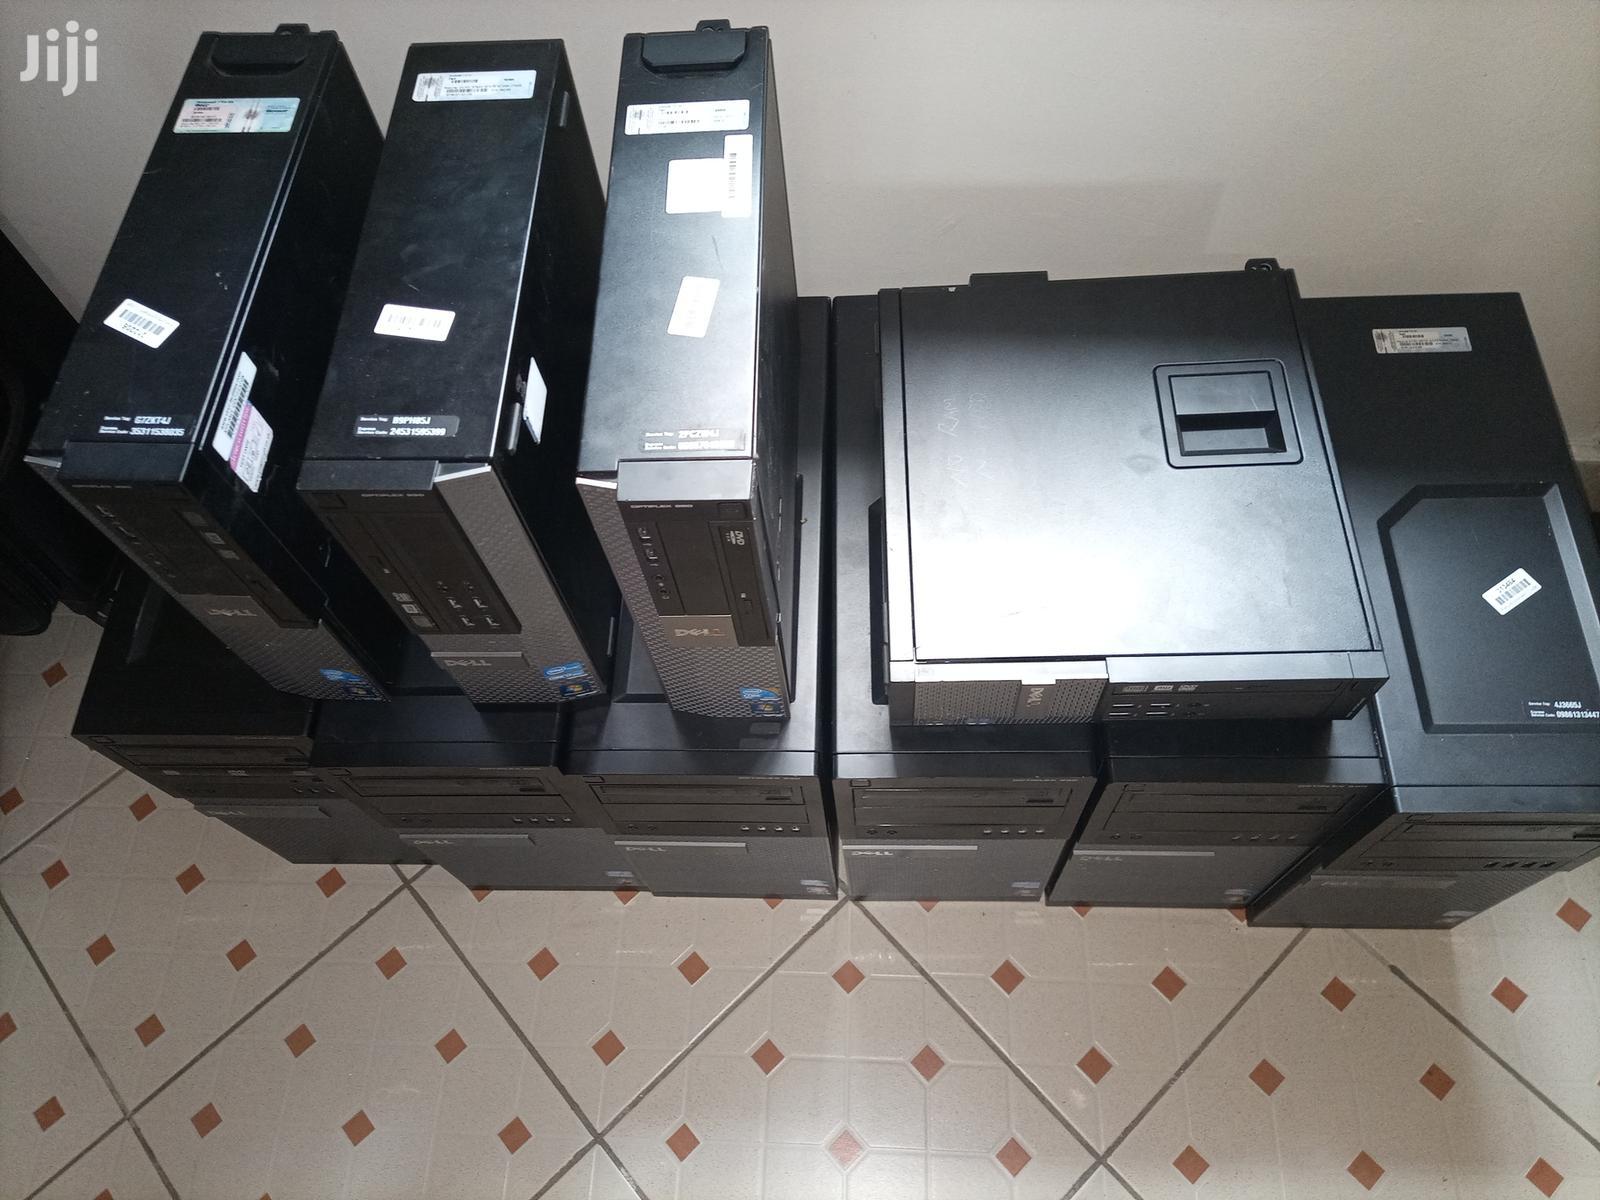 Desktop Computer Dell 4GB Intel Core i7 HDD 500GB   Laptops & Computers for sale in Nairobi Central, Nairobi, Kenya